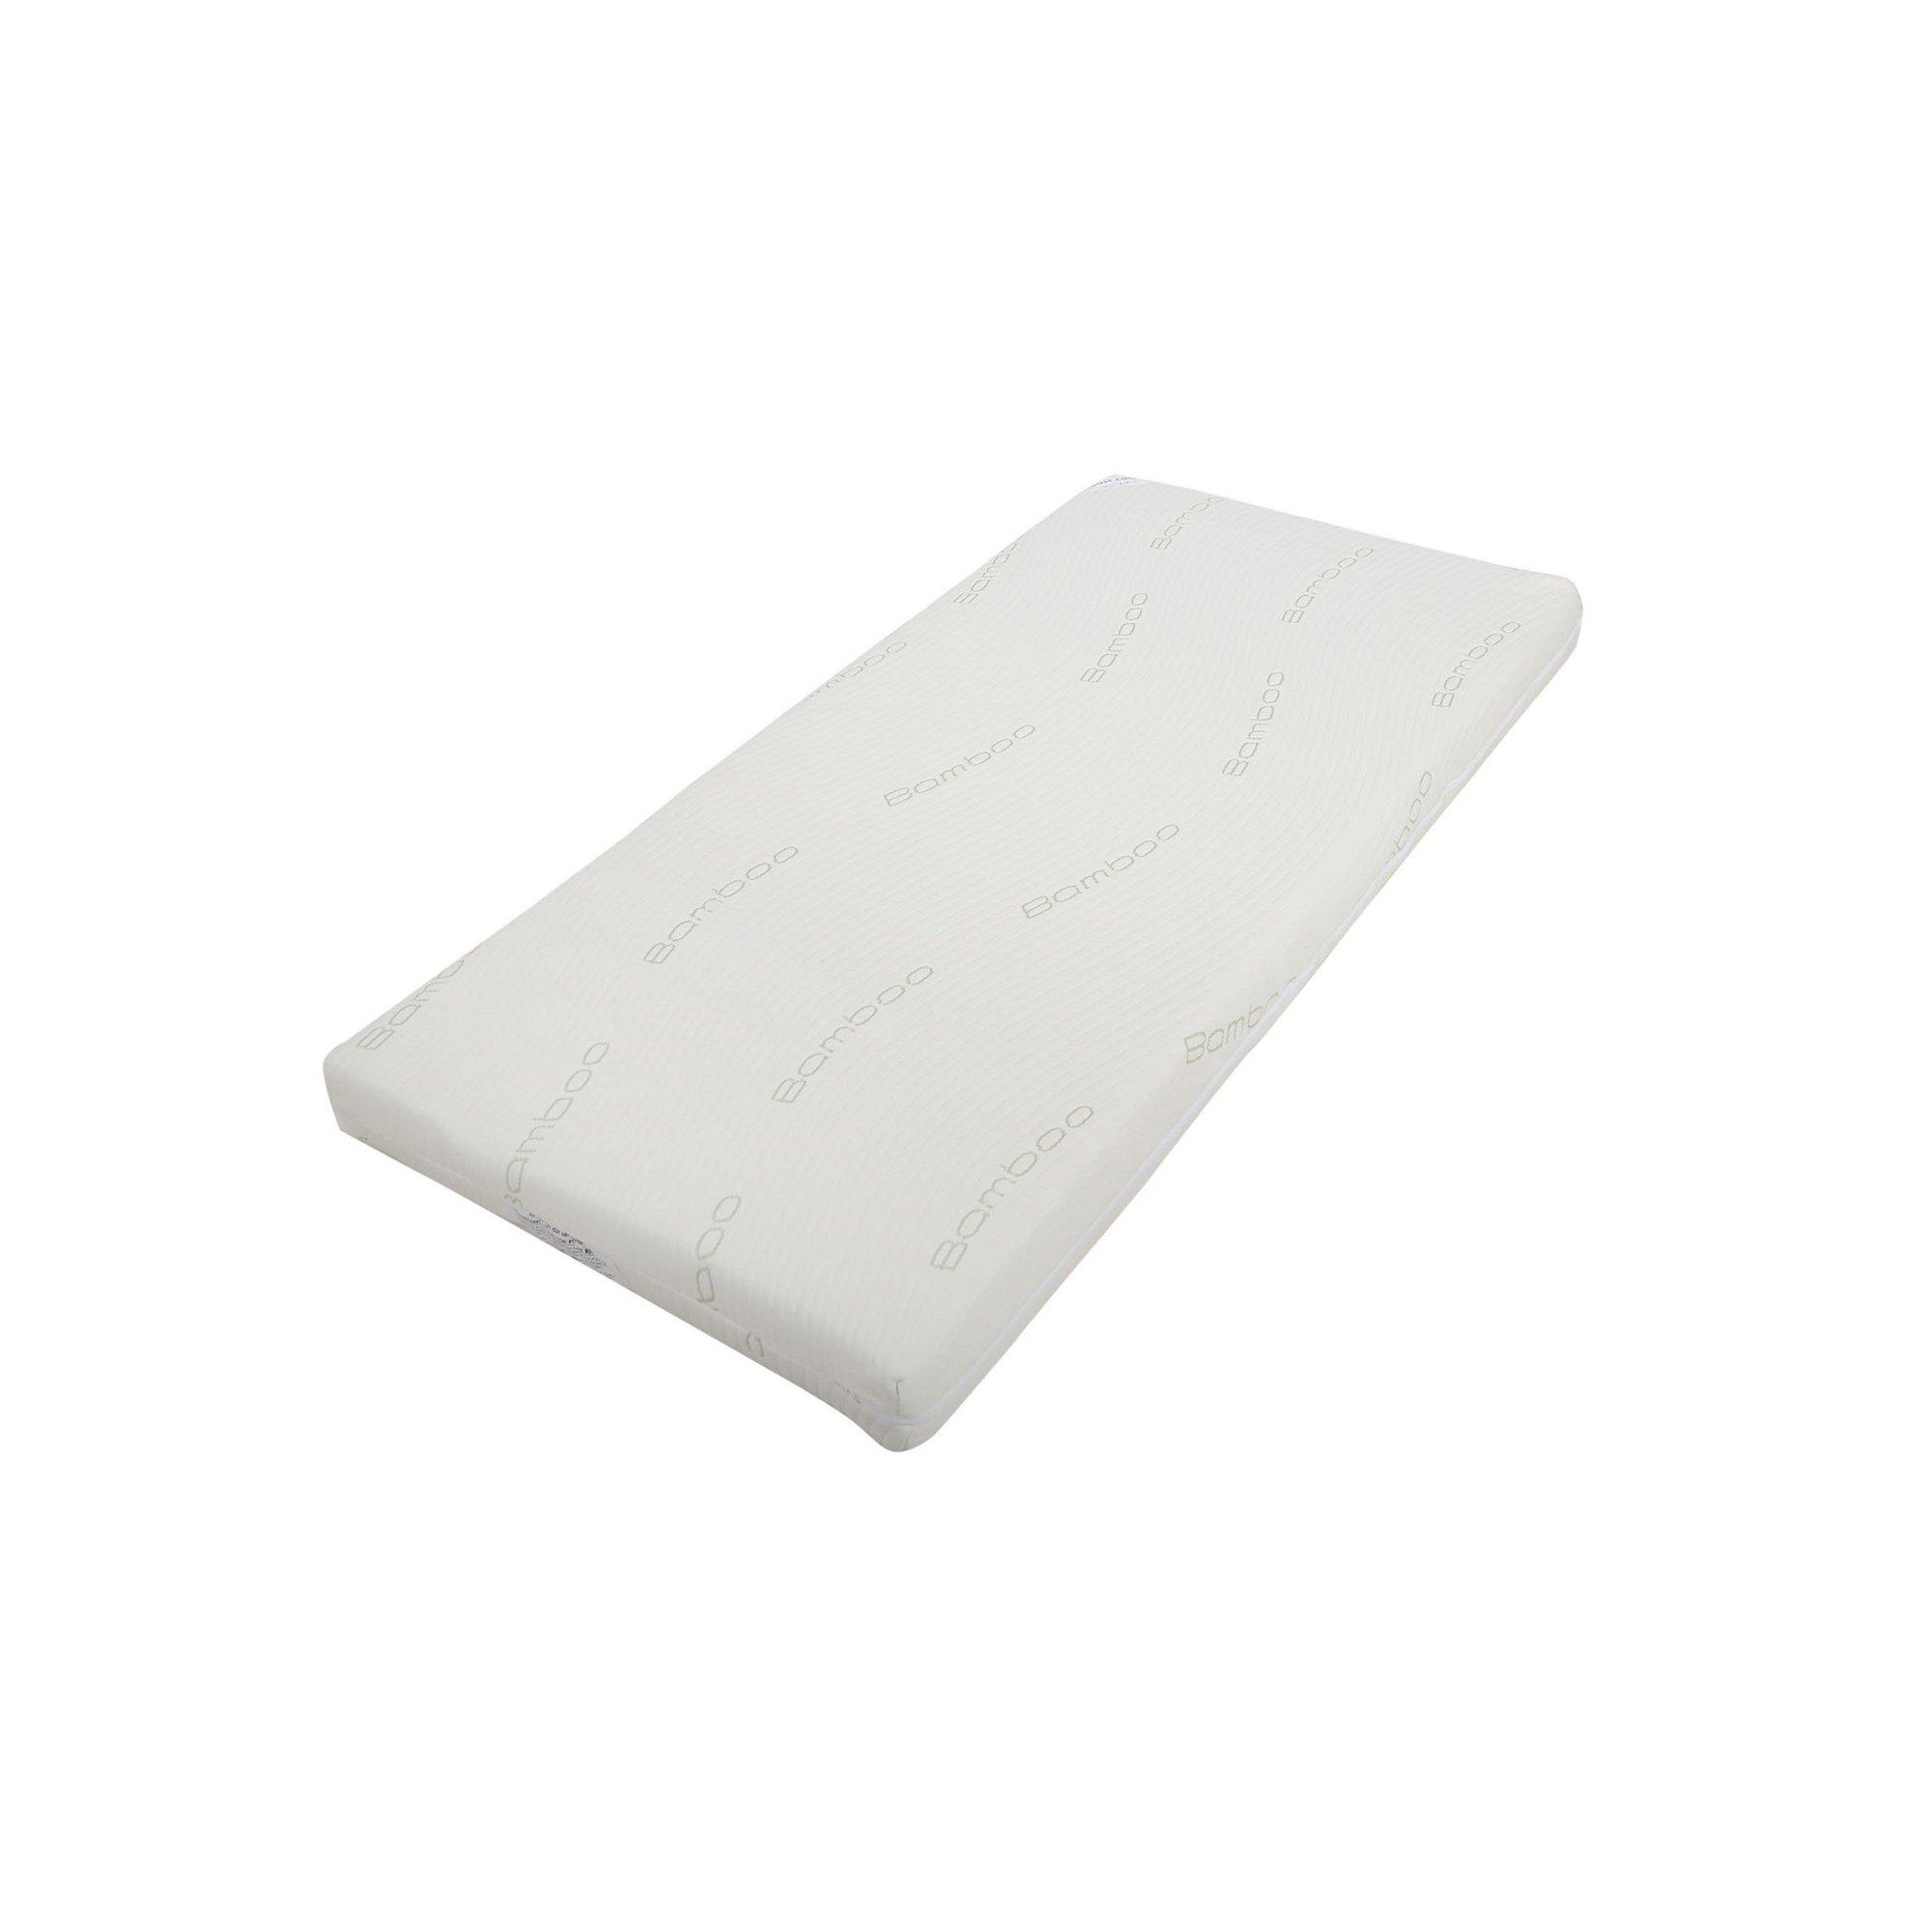 Image of All Natural Cot Bed Mattress